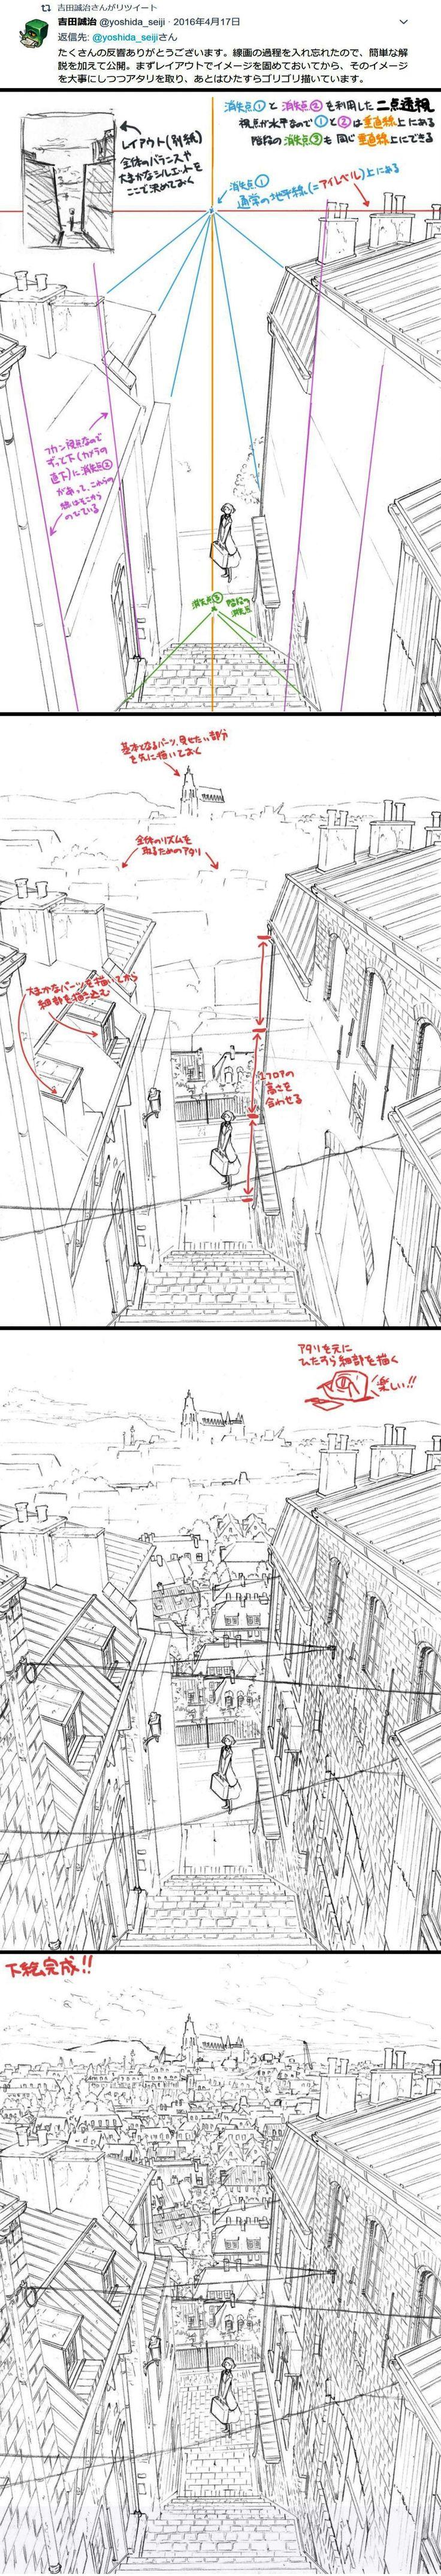 Perspective tutorial sketch